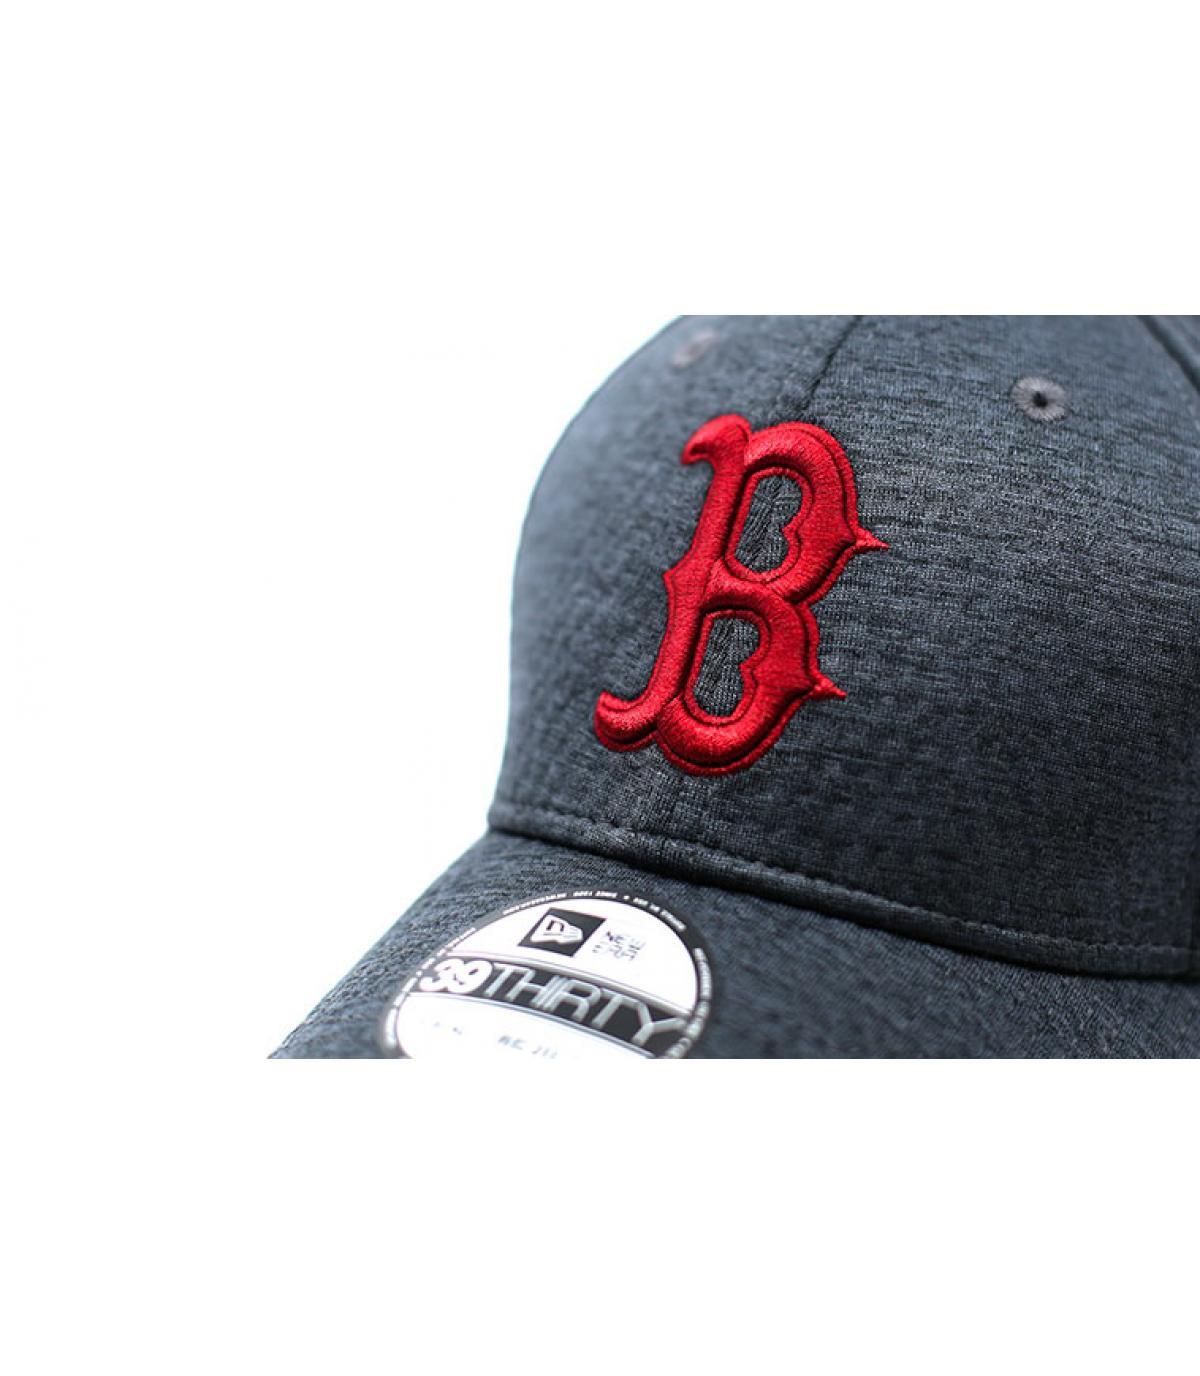 Détails Casquette Boston Dryswitch Jersey 39Thirty black cardinal - image 3